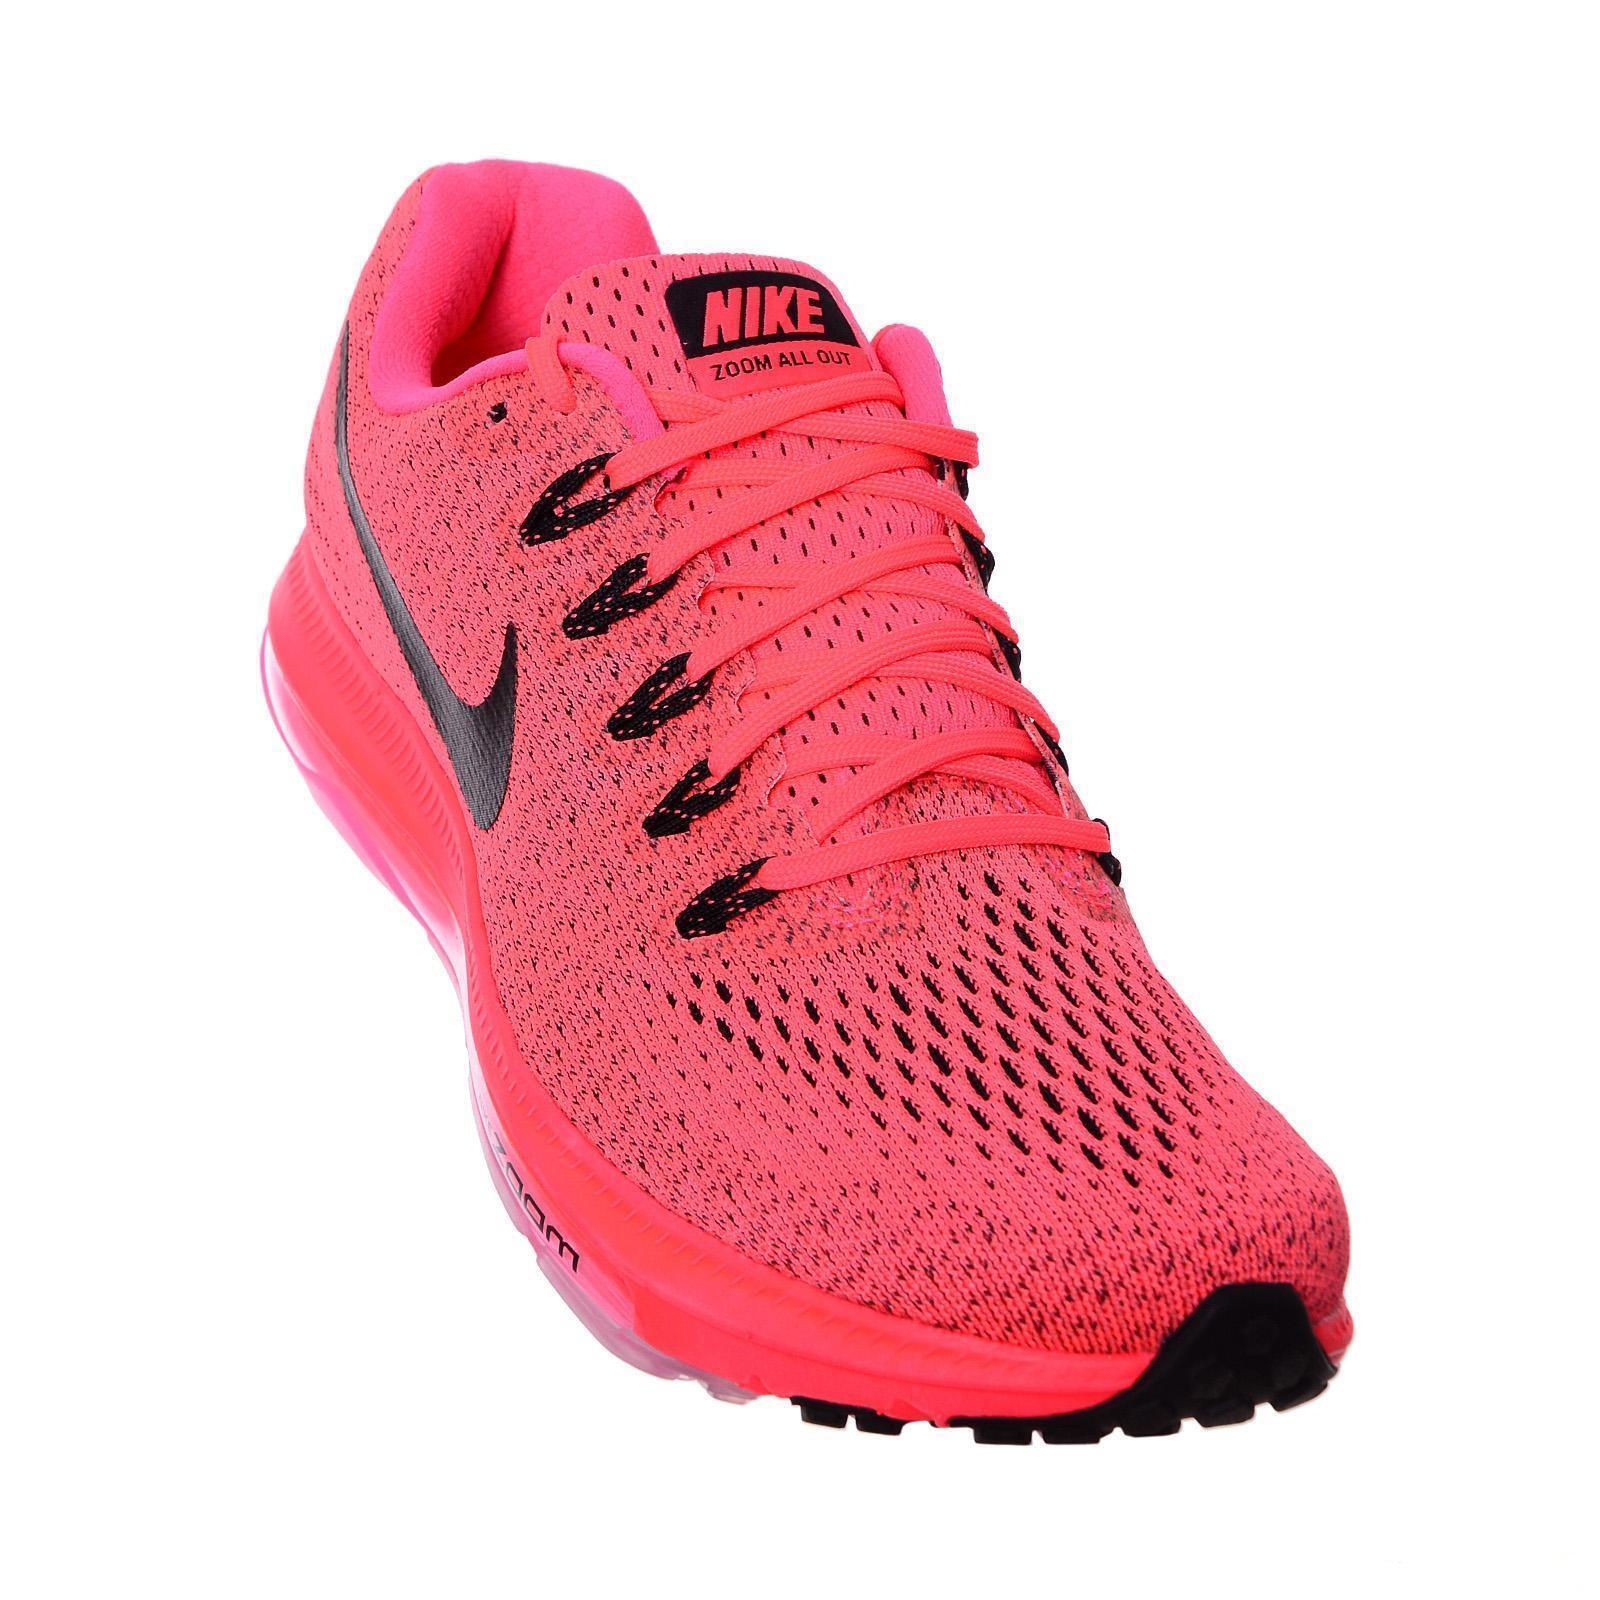 Damen Nike Zoom alle draußen Hot niedrig Hot draußen Punch Laufschuhe 878671 601 f3137e